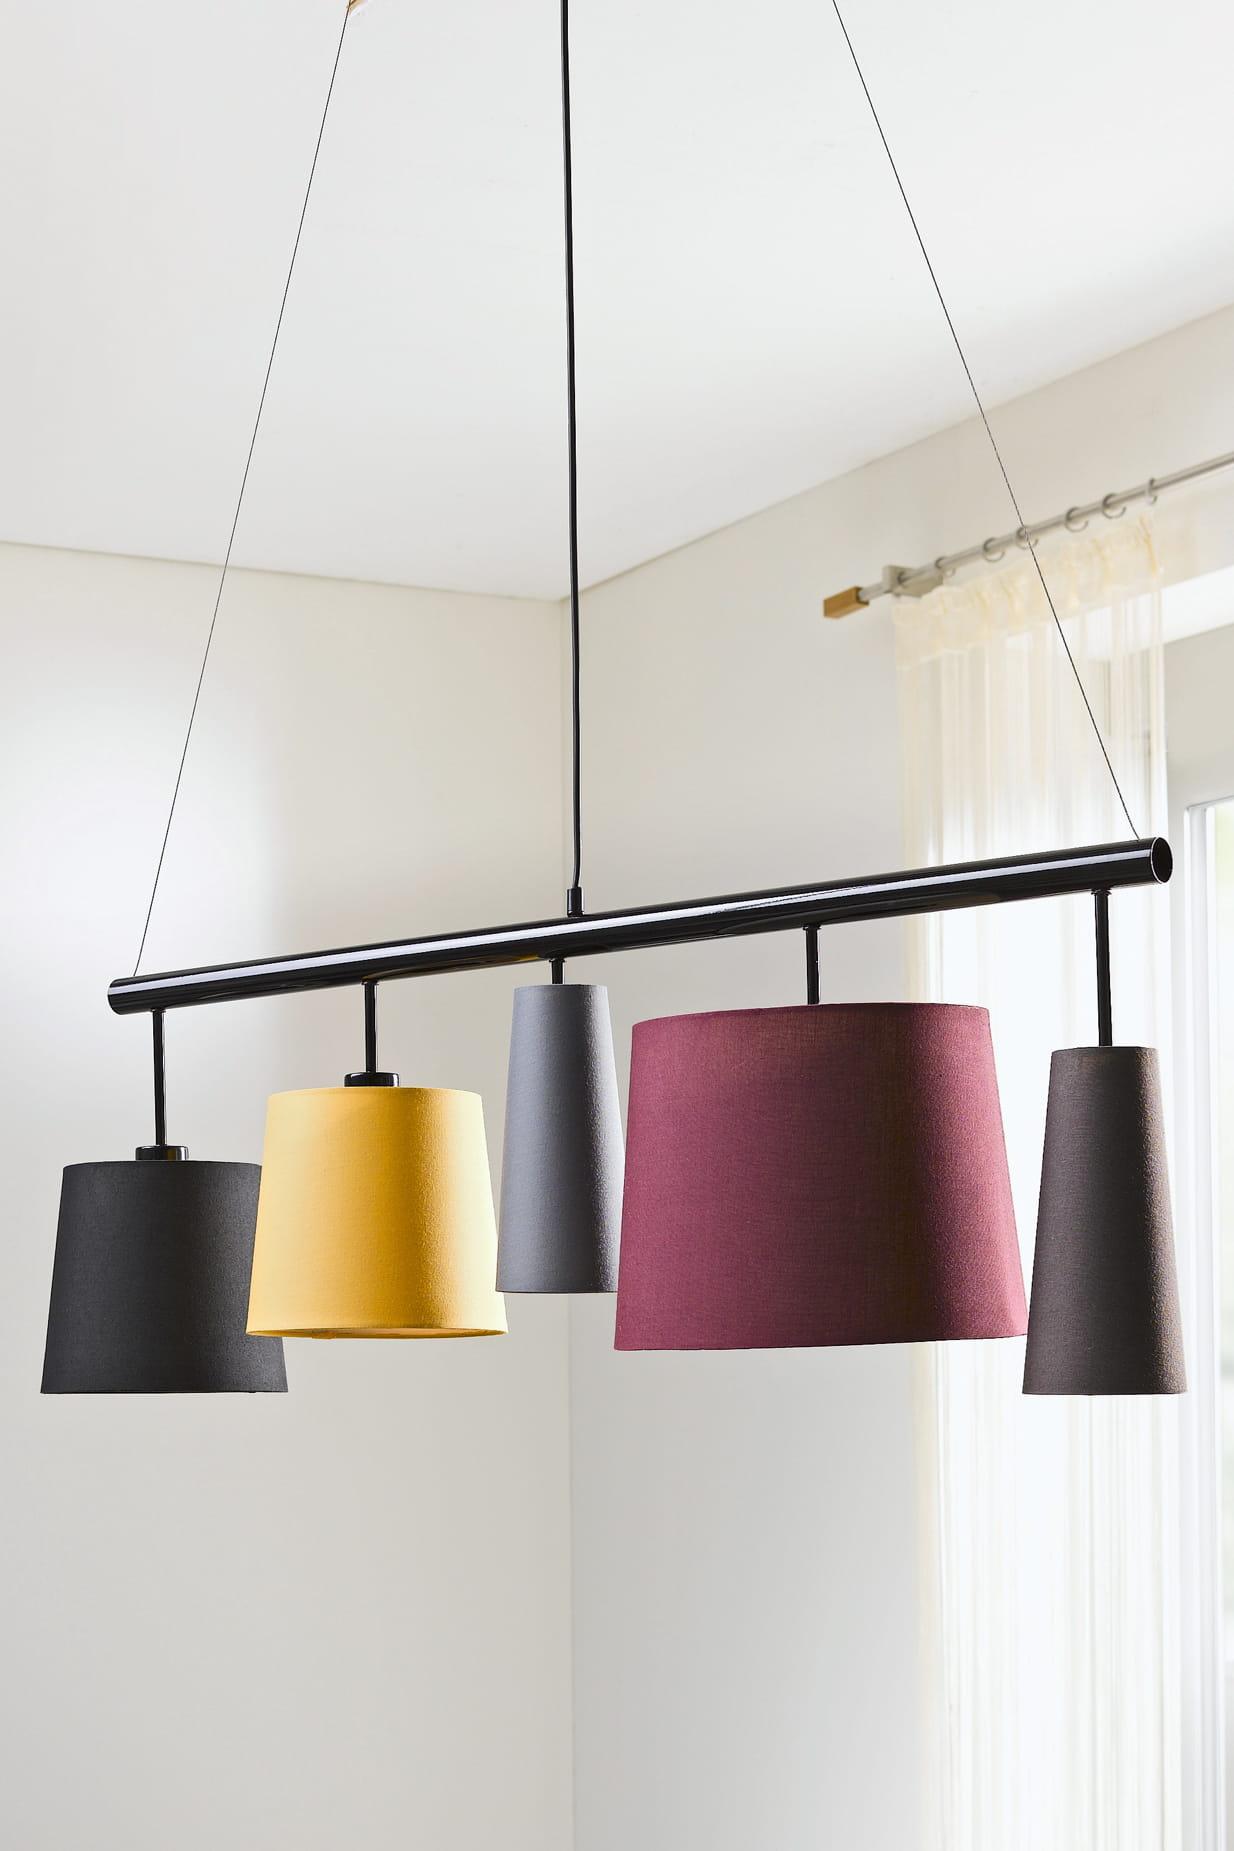 suspension cinq abat jour d 39 helline. Black Bedroom Furniture Sets. Home Design Ideas